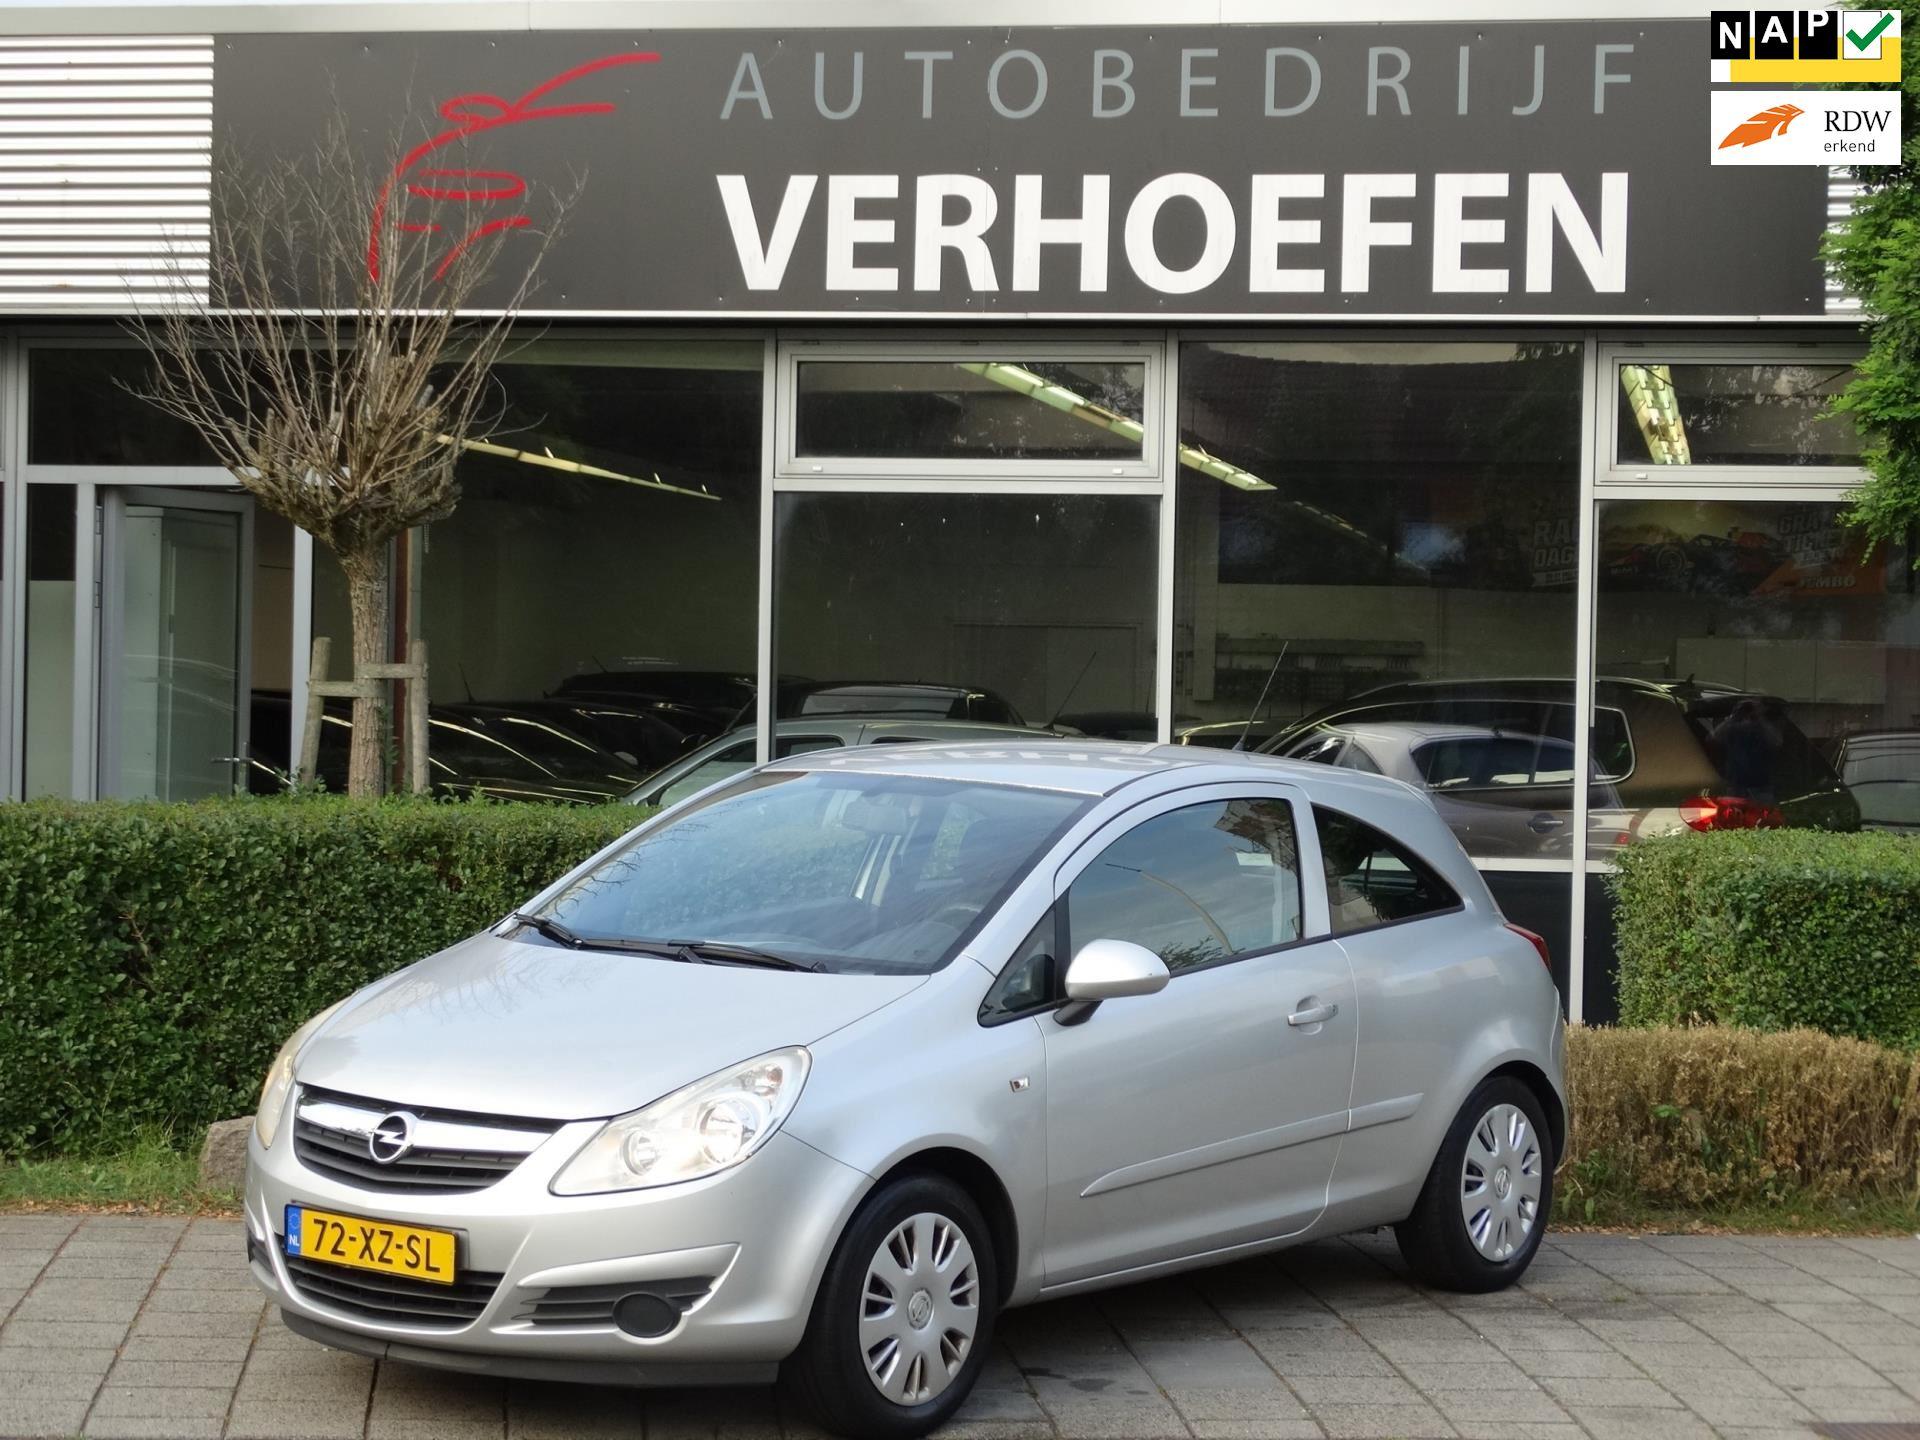 Opel Corsa occasion - Autobedrijf Verhoefen